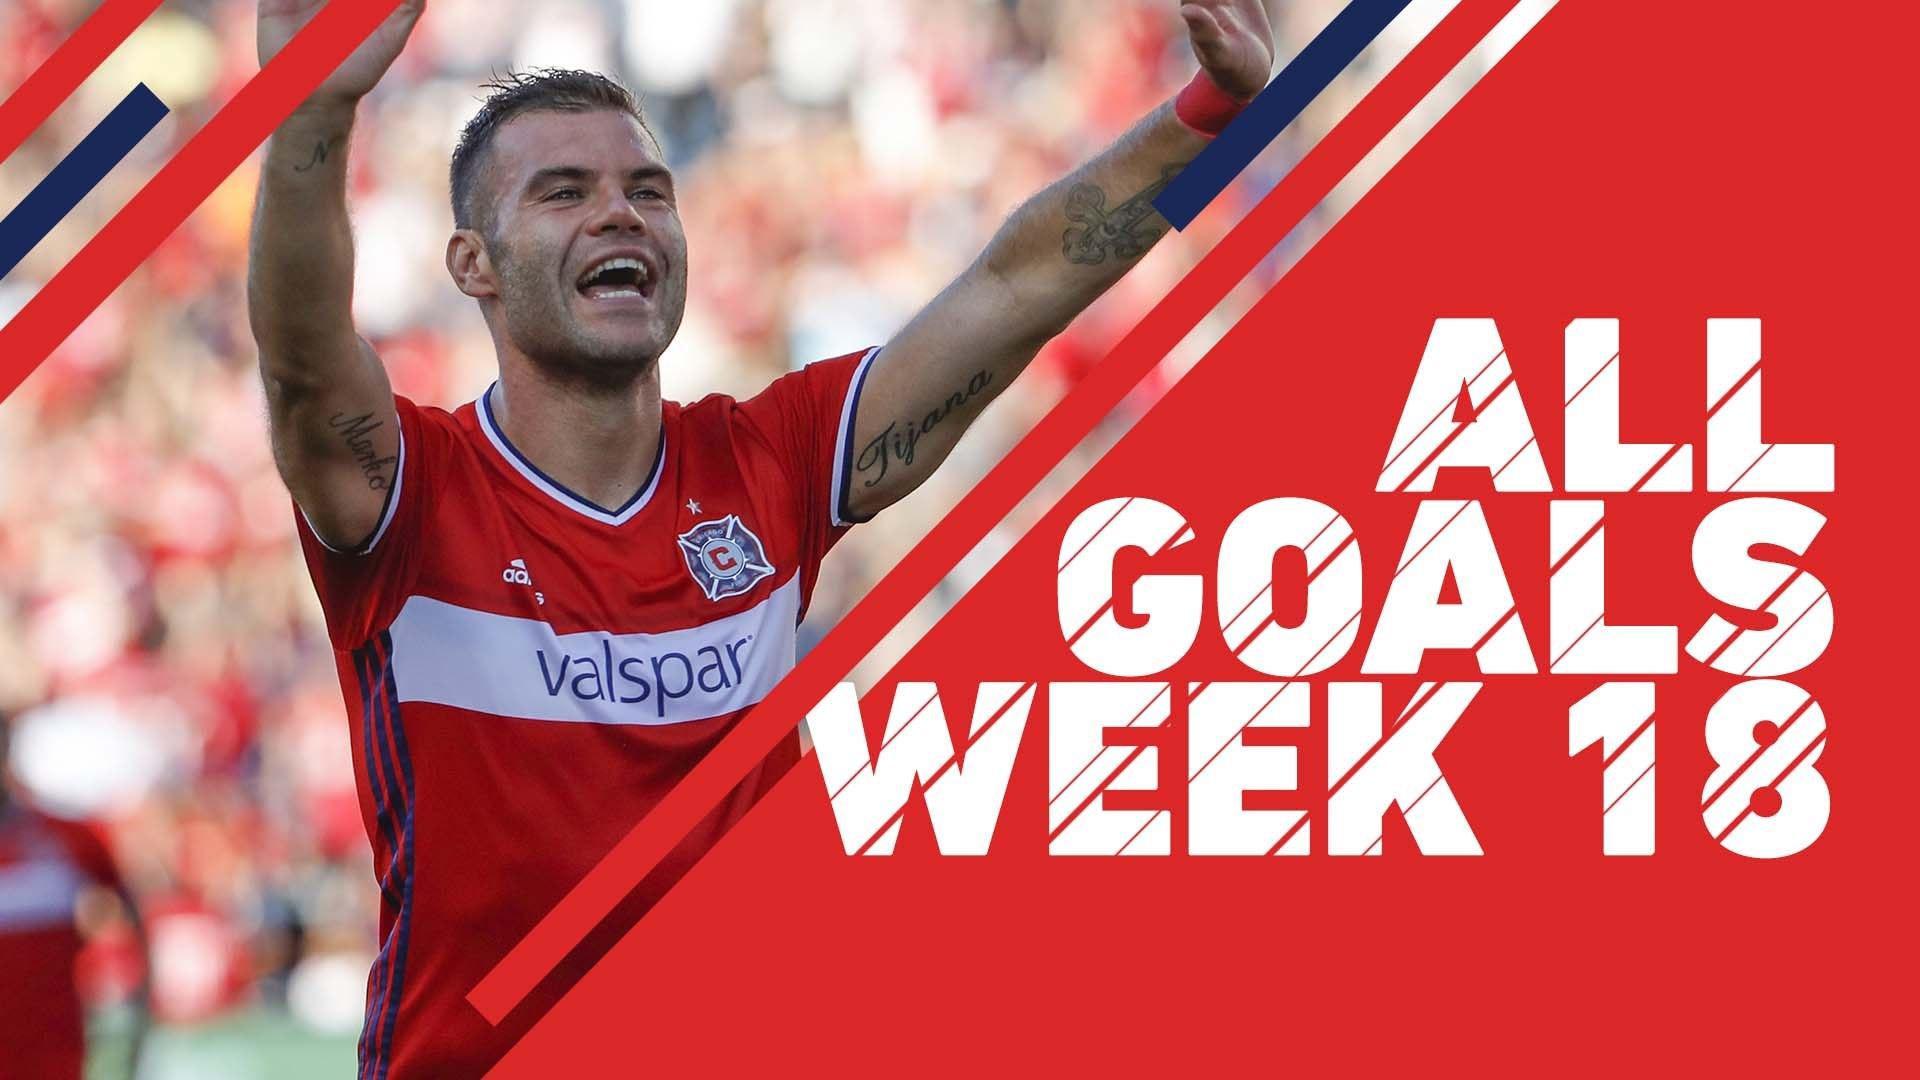 Watch: Every goal scored in Week 18 of the 2017 MLS regular season